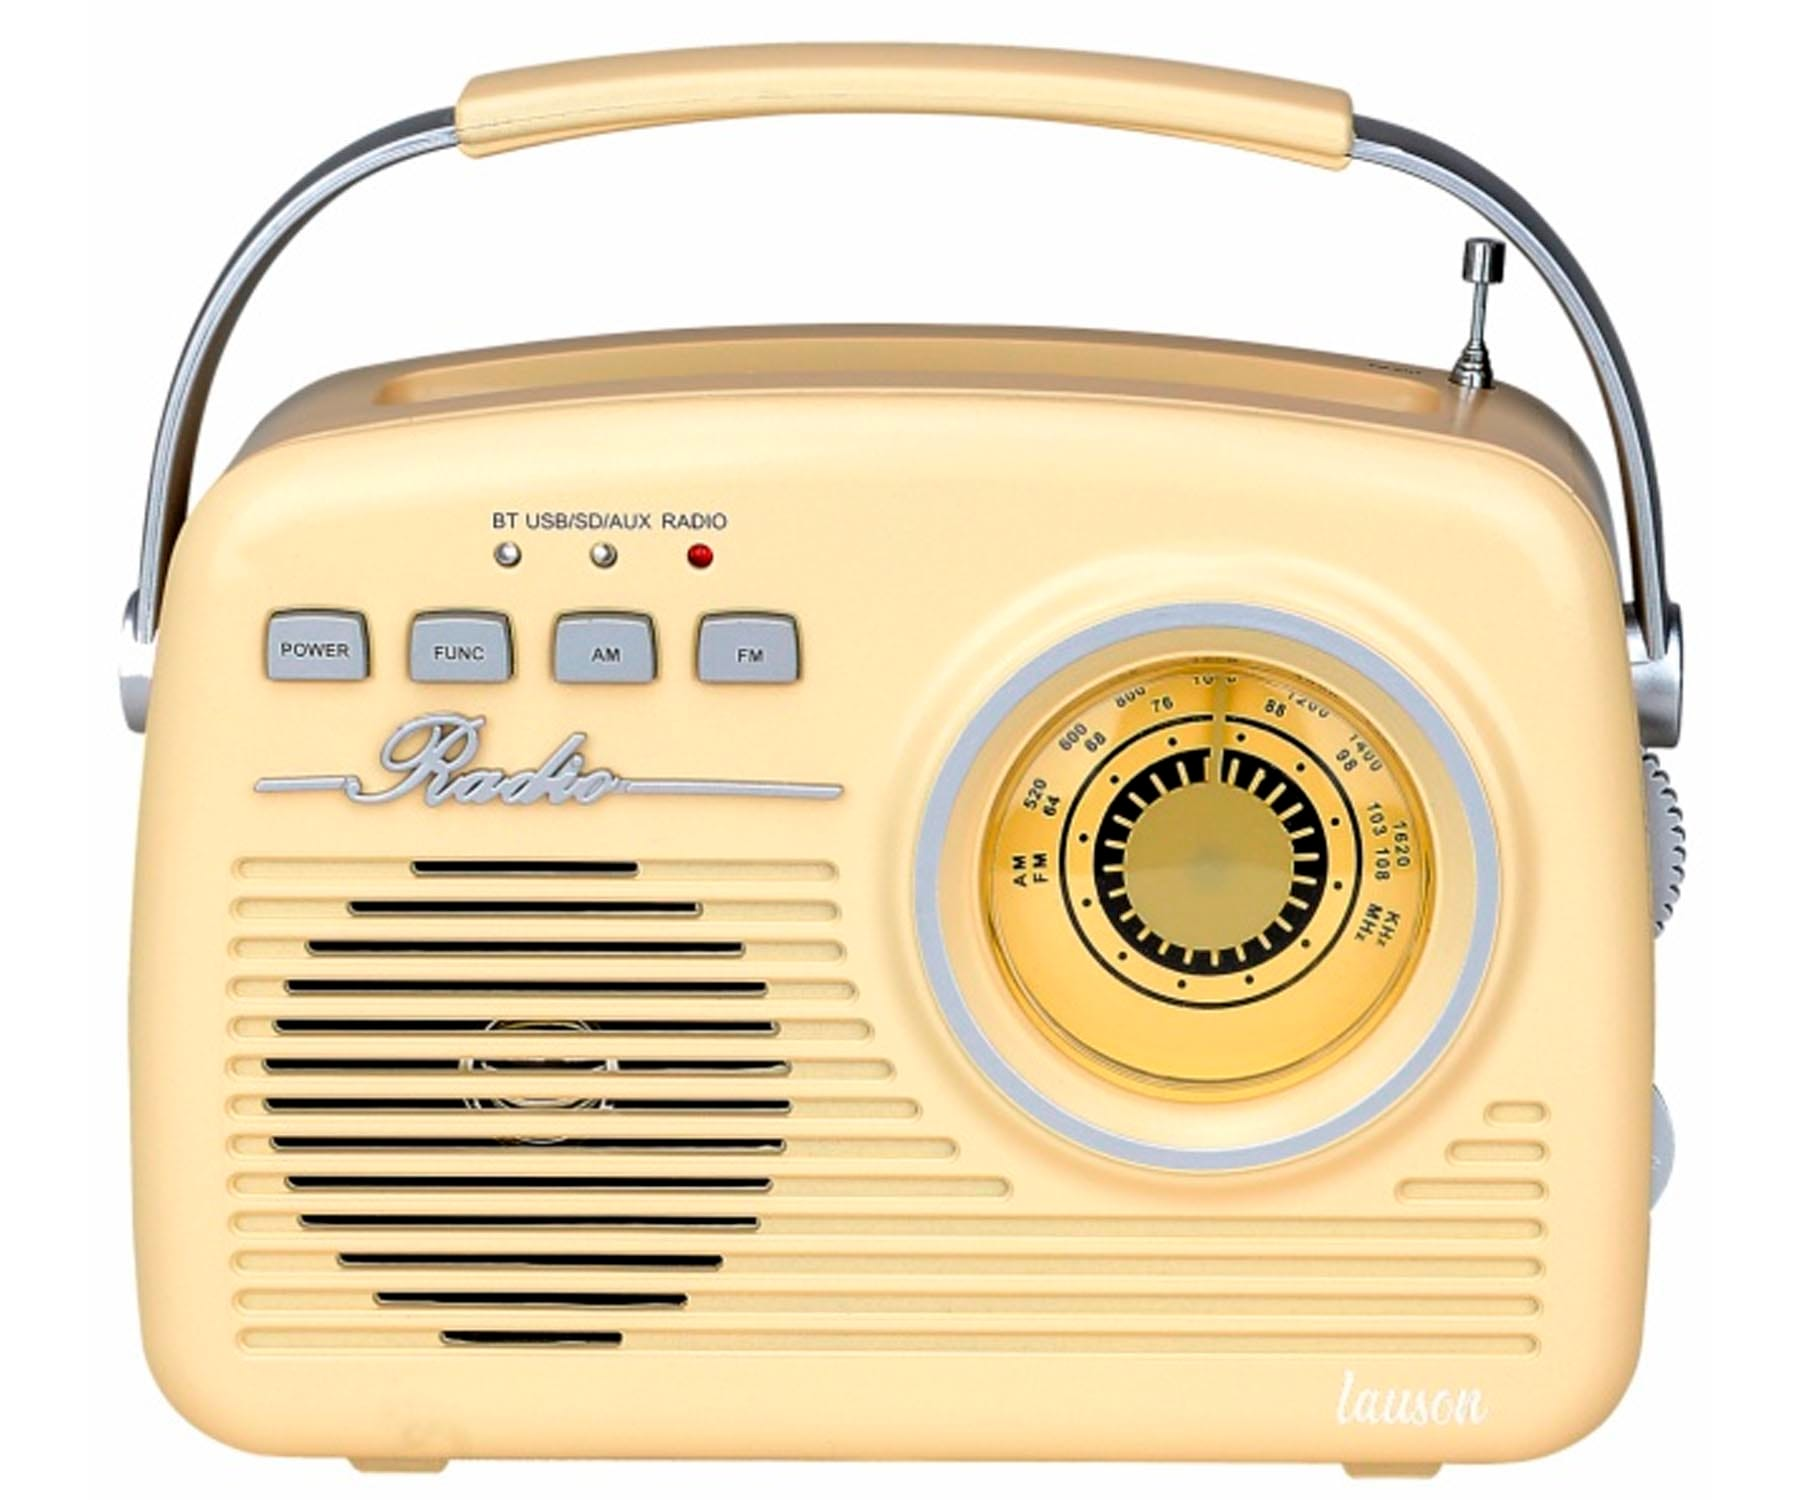 LAUSON RA143 RADIO VINTAGE CREMA ANALÓGICA CON ALTAVOZ INTEGRADO 2W AM/FM BATERÍA RECARGABLE BLUETOOTH USB SD